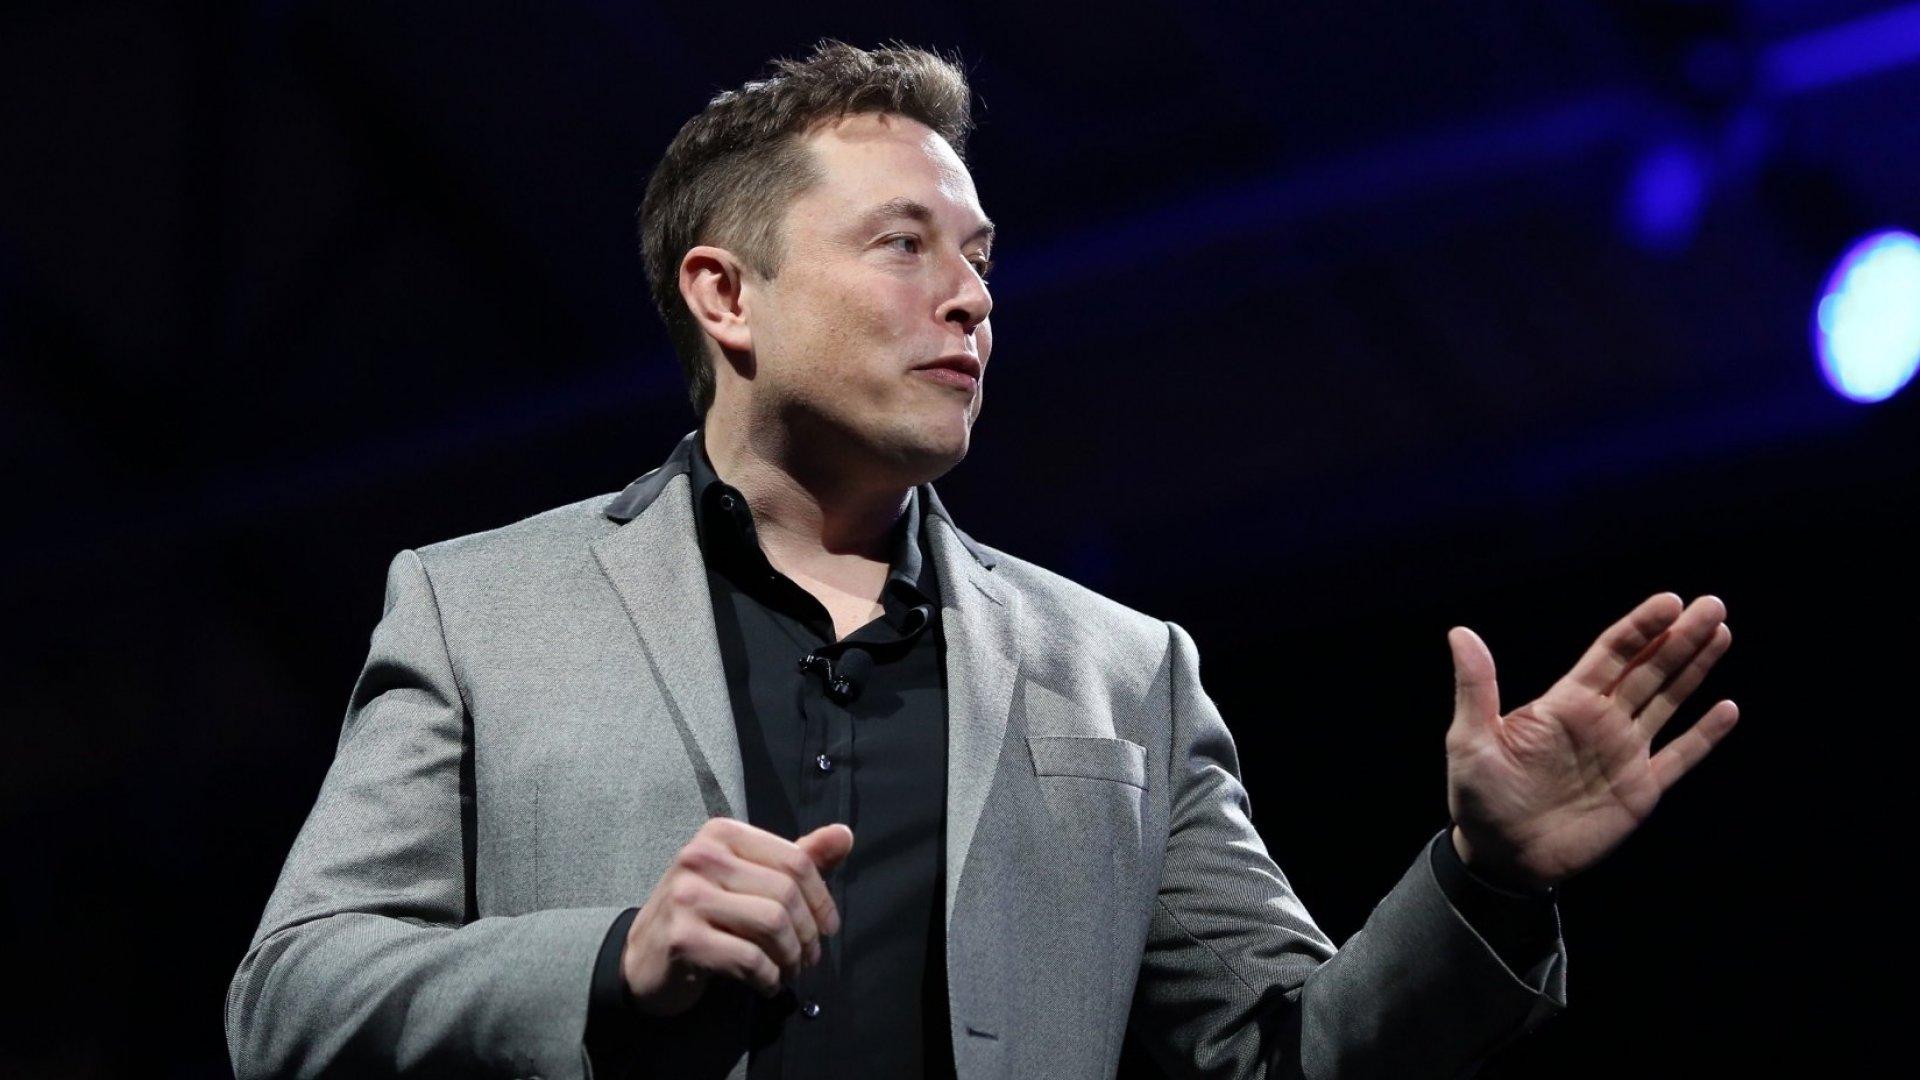 Elon Musk Hints That Something Big Is on the Horizon for Tesla